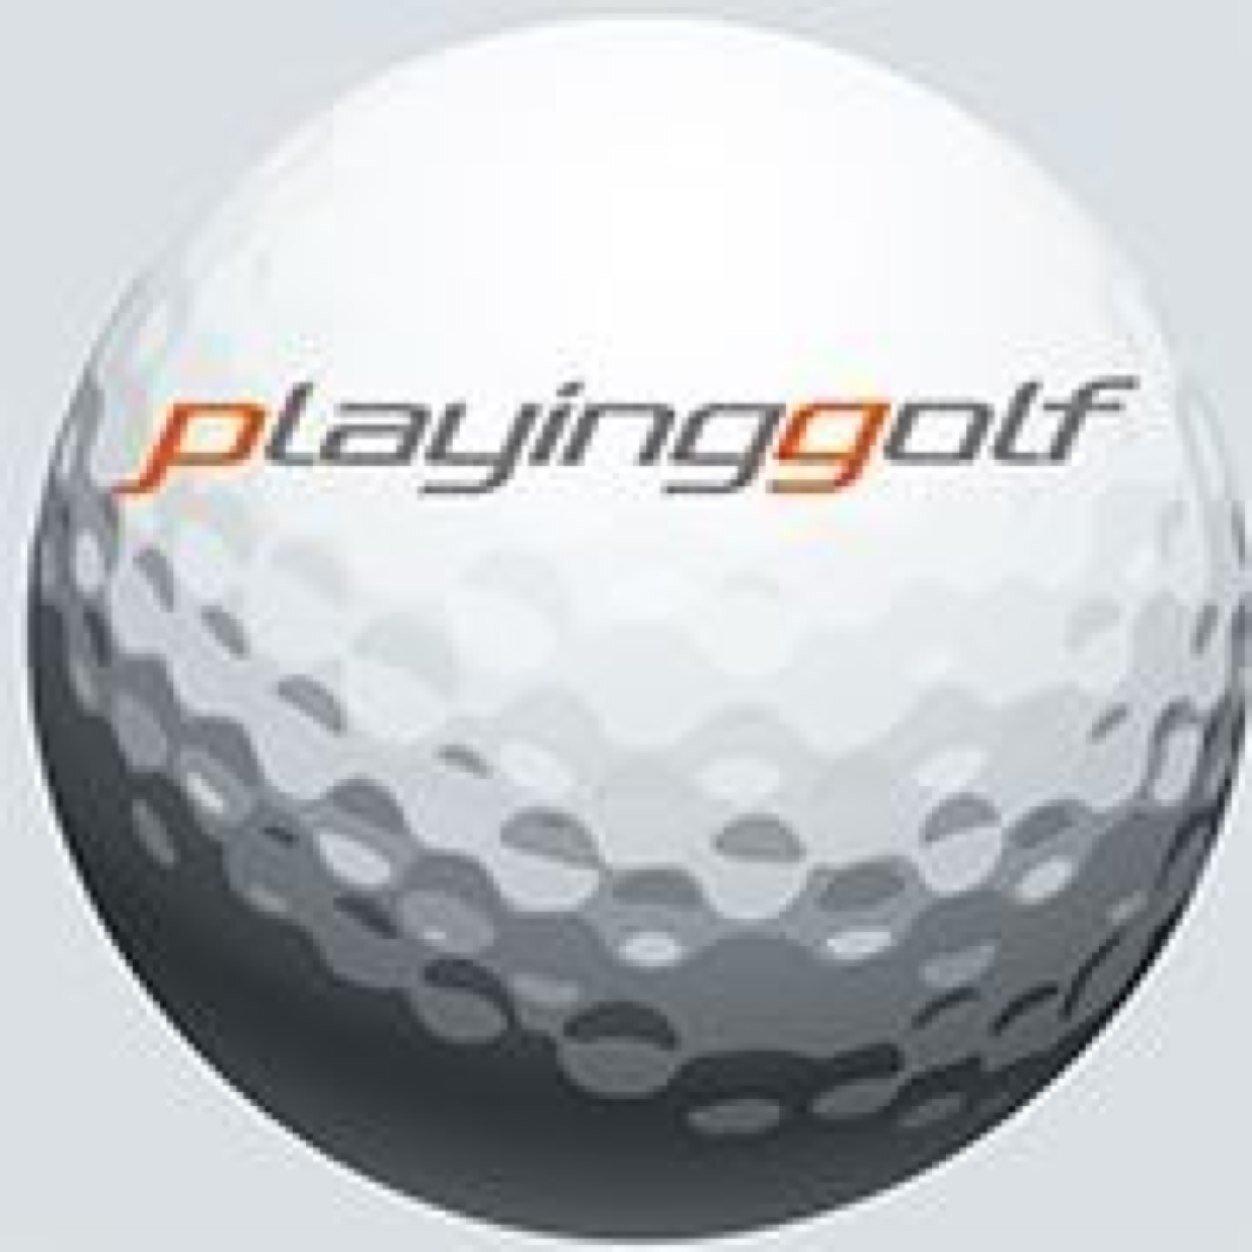 @PlayingGolffr